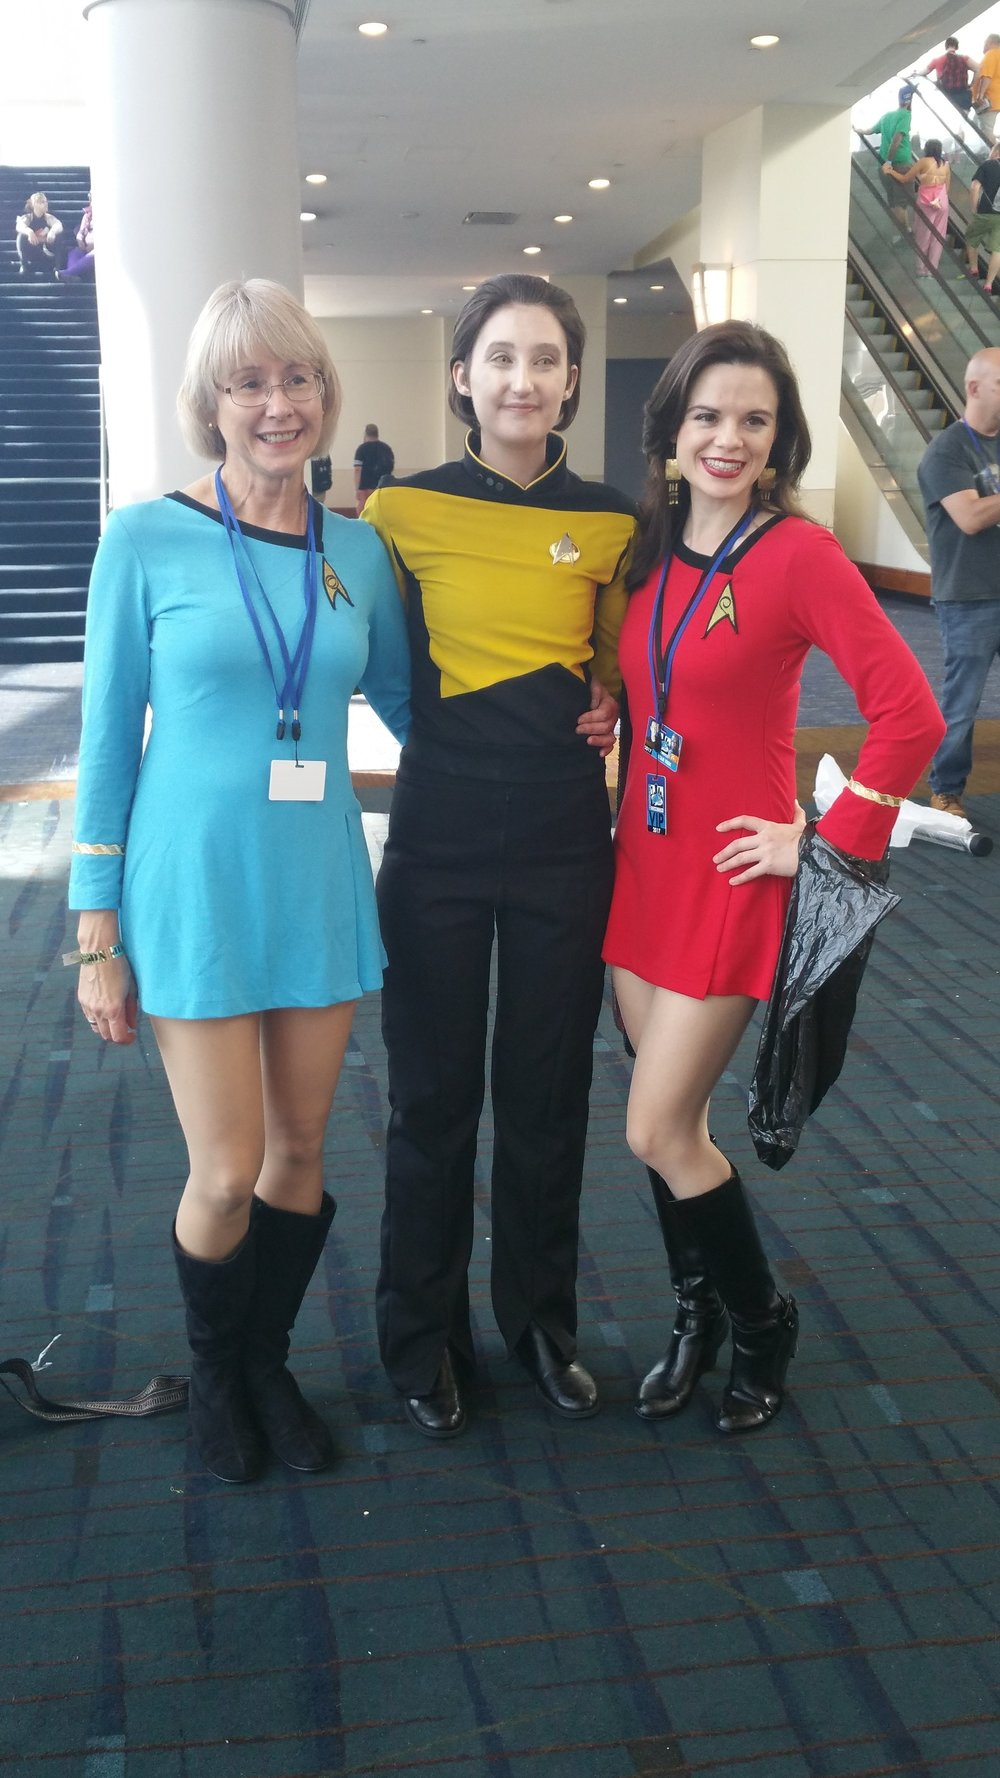 Trekkie crew, L-R: Elizabeth, Brittany, and Mary Beth